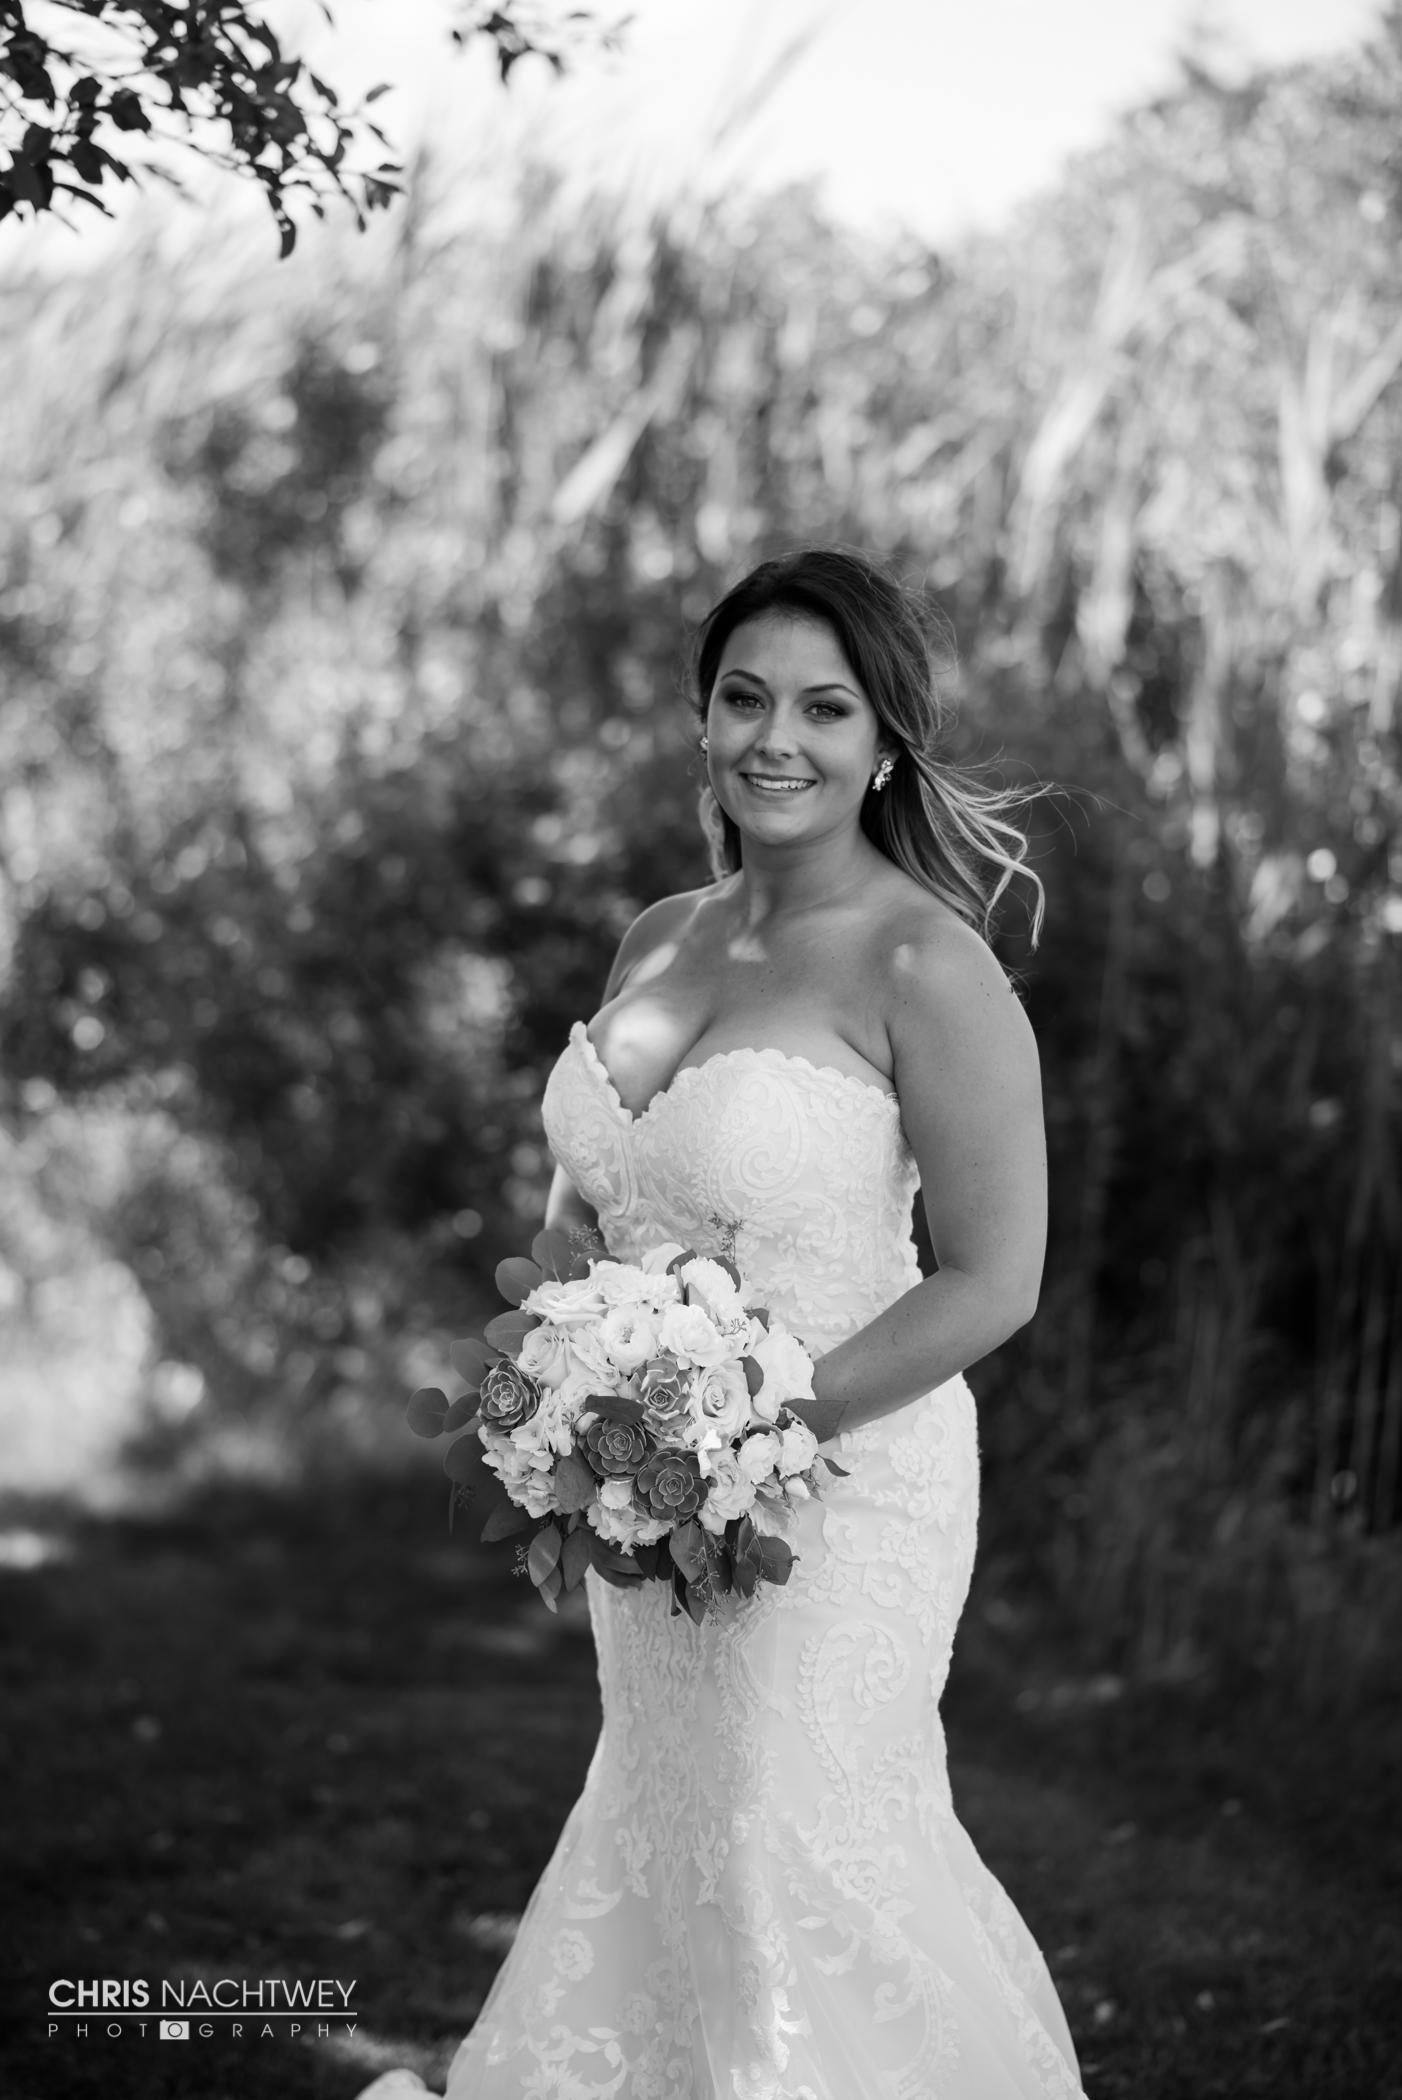 saltwater-farm-vineyard-wedding-photos-lindsay-gabe-chris-nachtwey-photography-2017-24.jpg